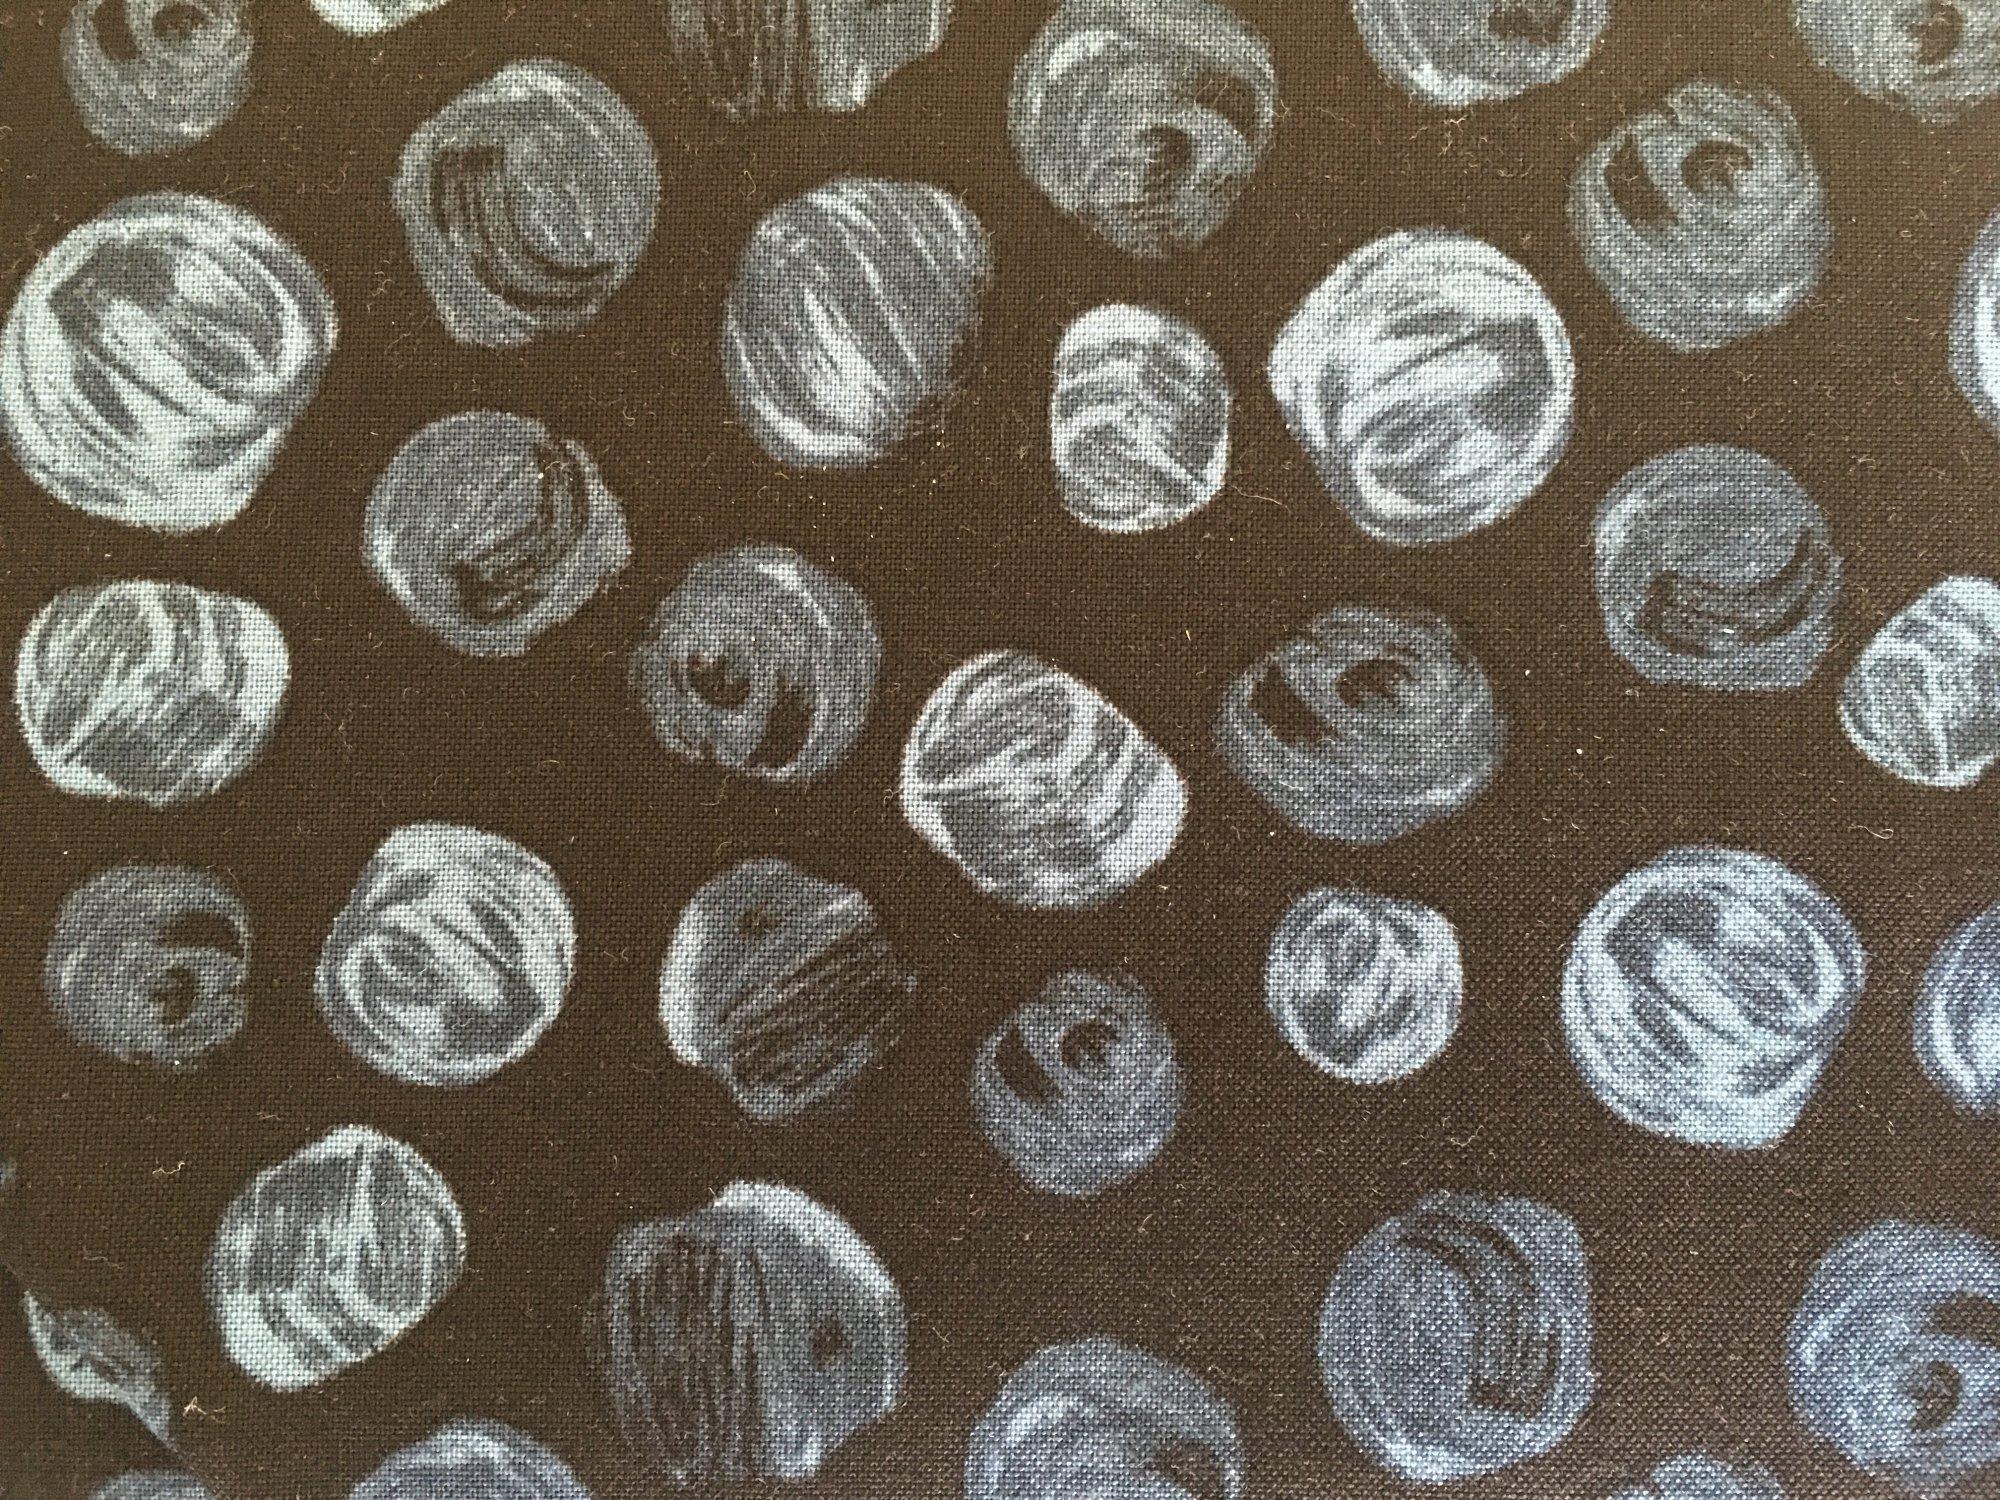 FLORIANNA BEADS BLACK FLOR493 P&B Textiles